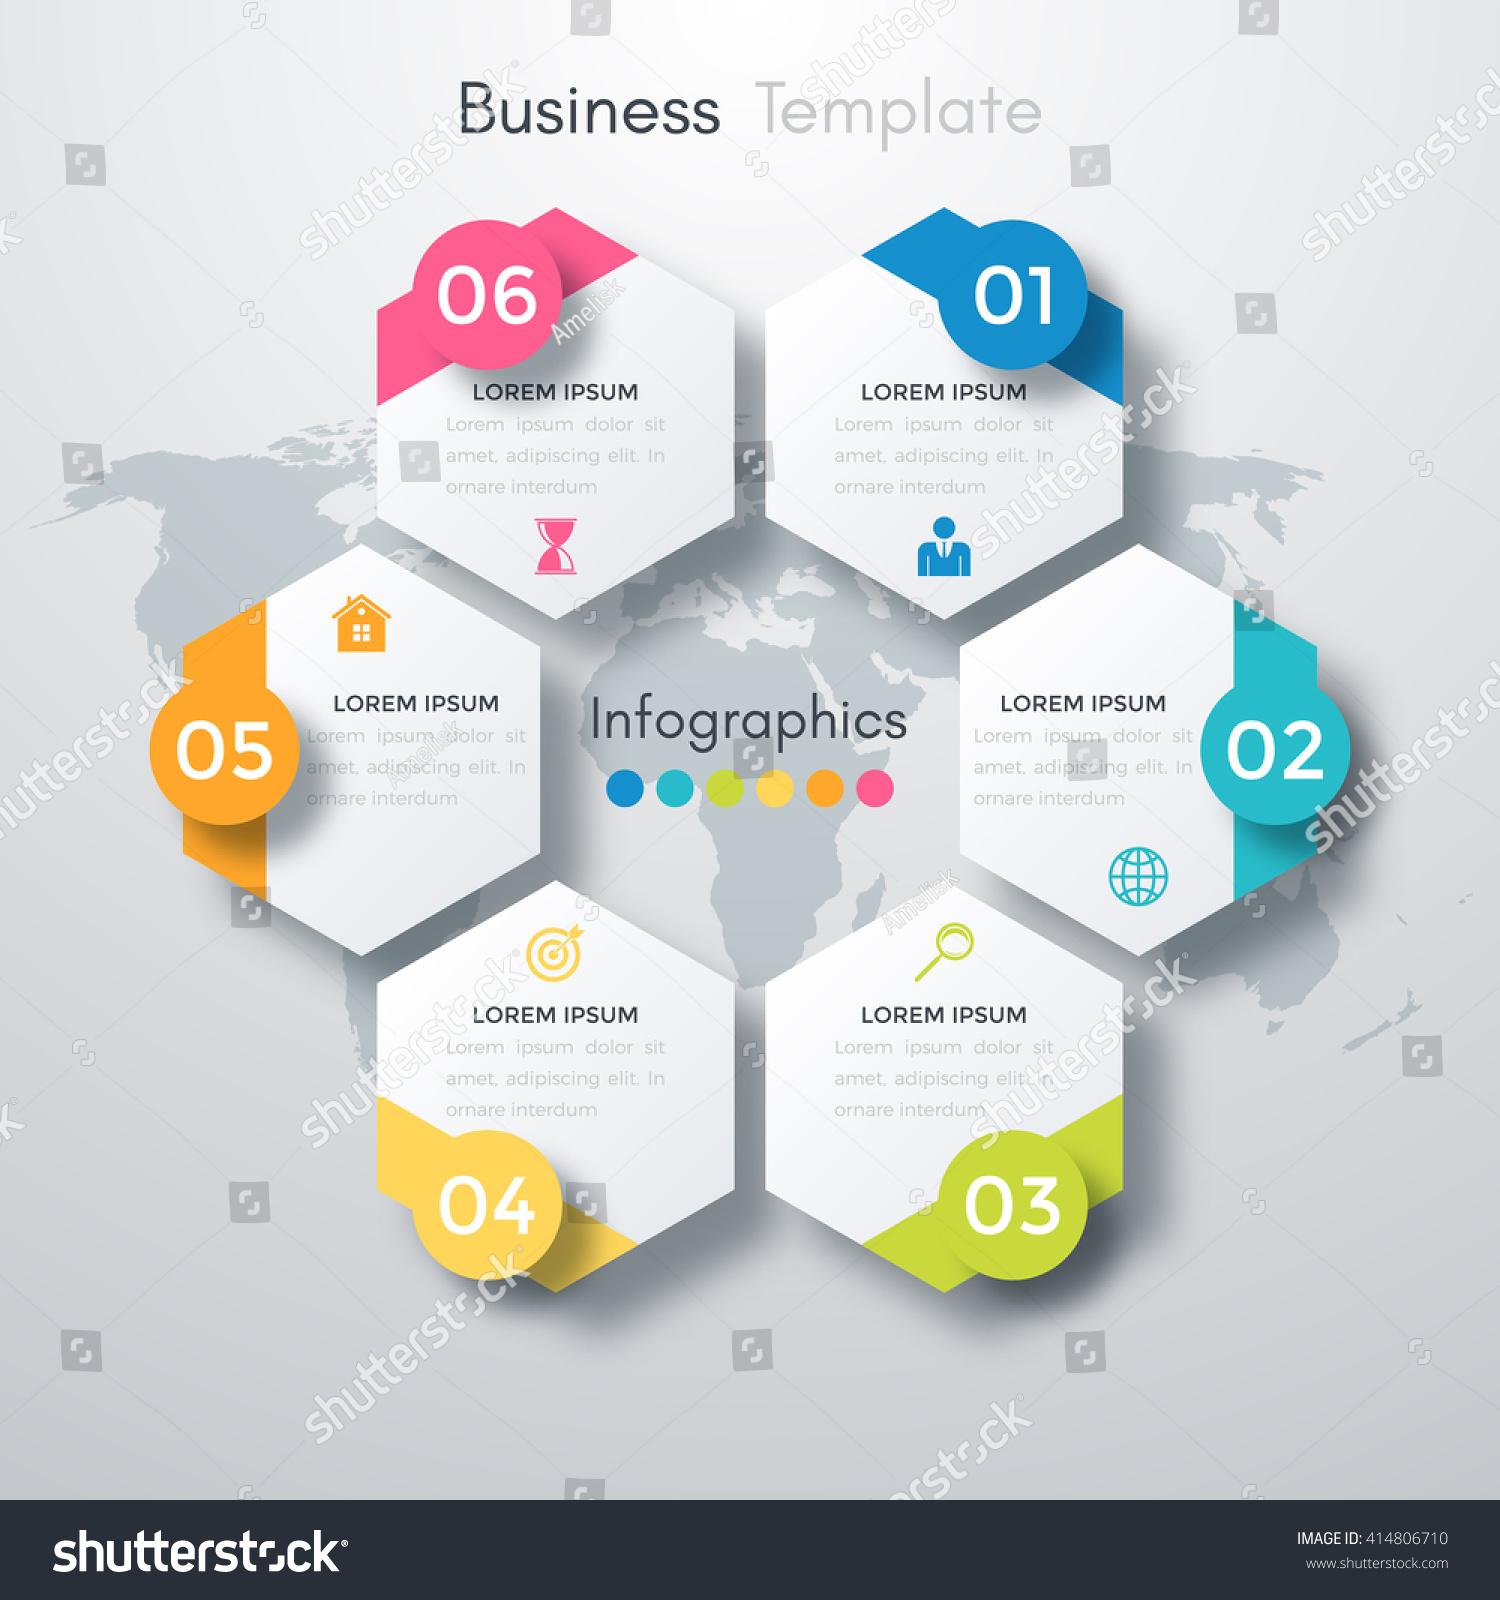 Business website gayoptions